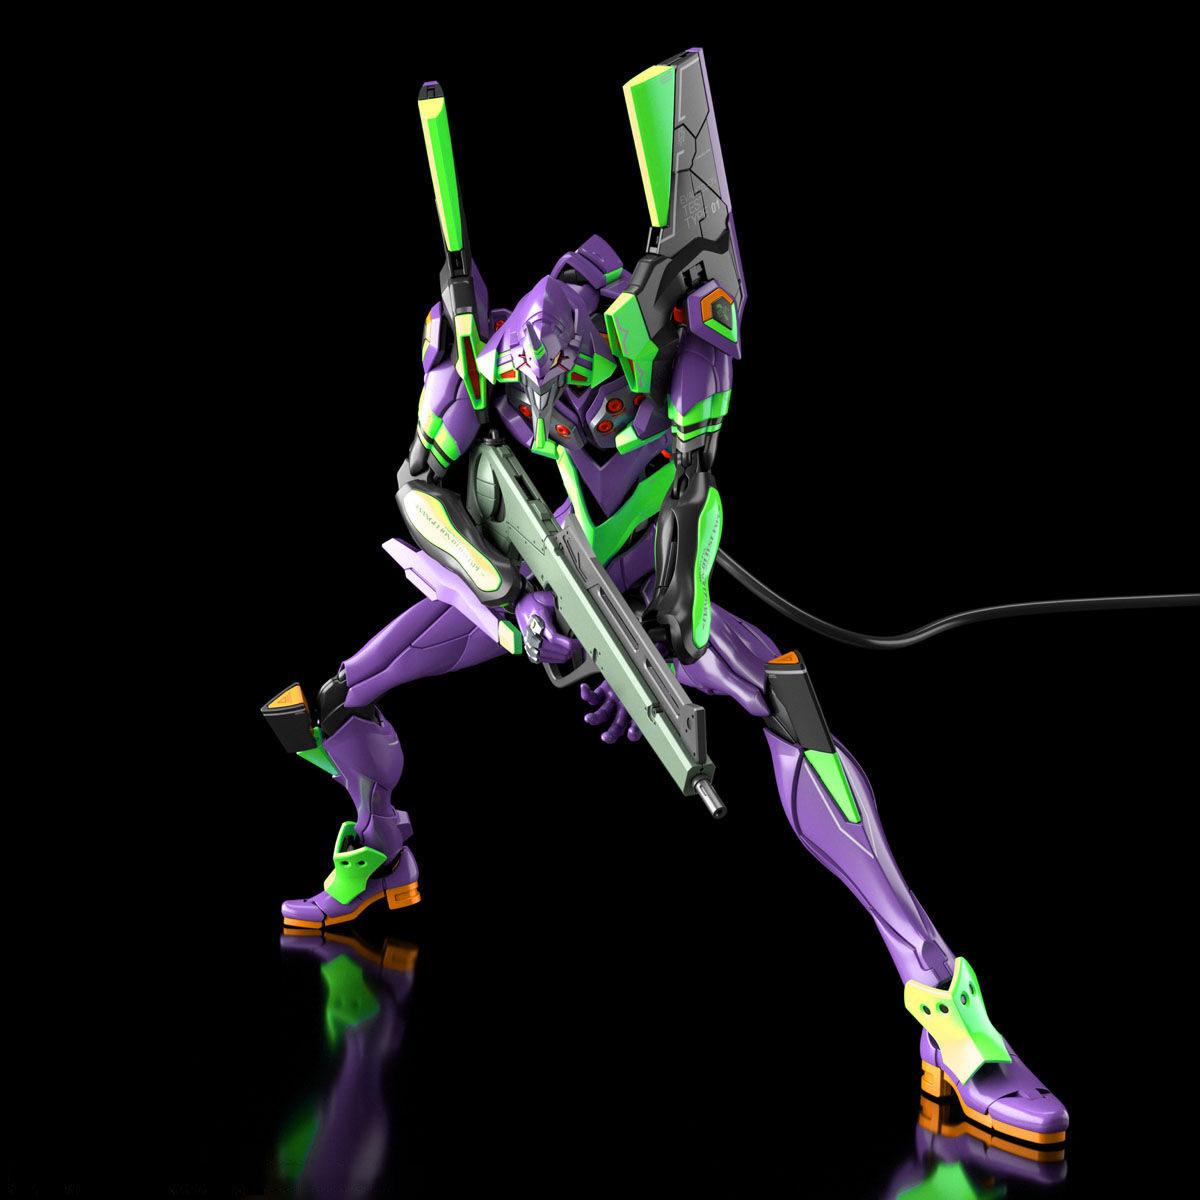 RG Multipurpose Humanoid Decisive Weapon, Artificial Human Evangelion Unit-01(EVANGELION:3.0+1.0) [Mar 2022 Delivery]